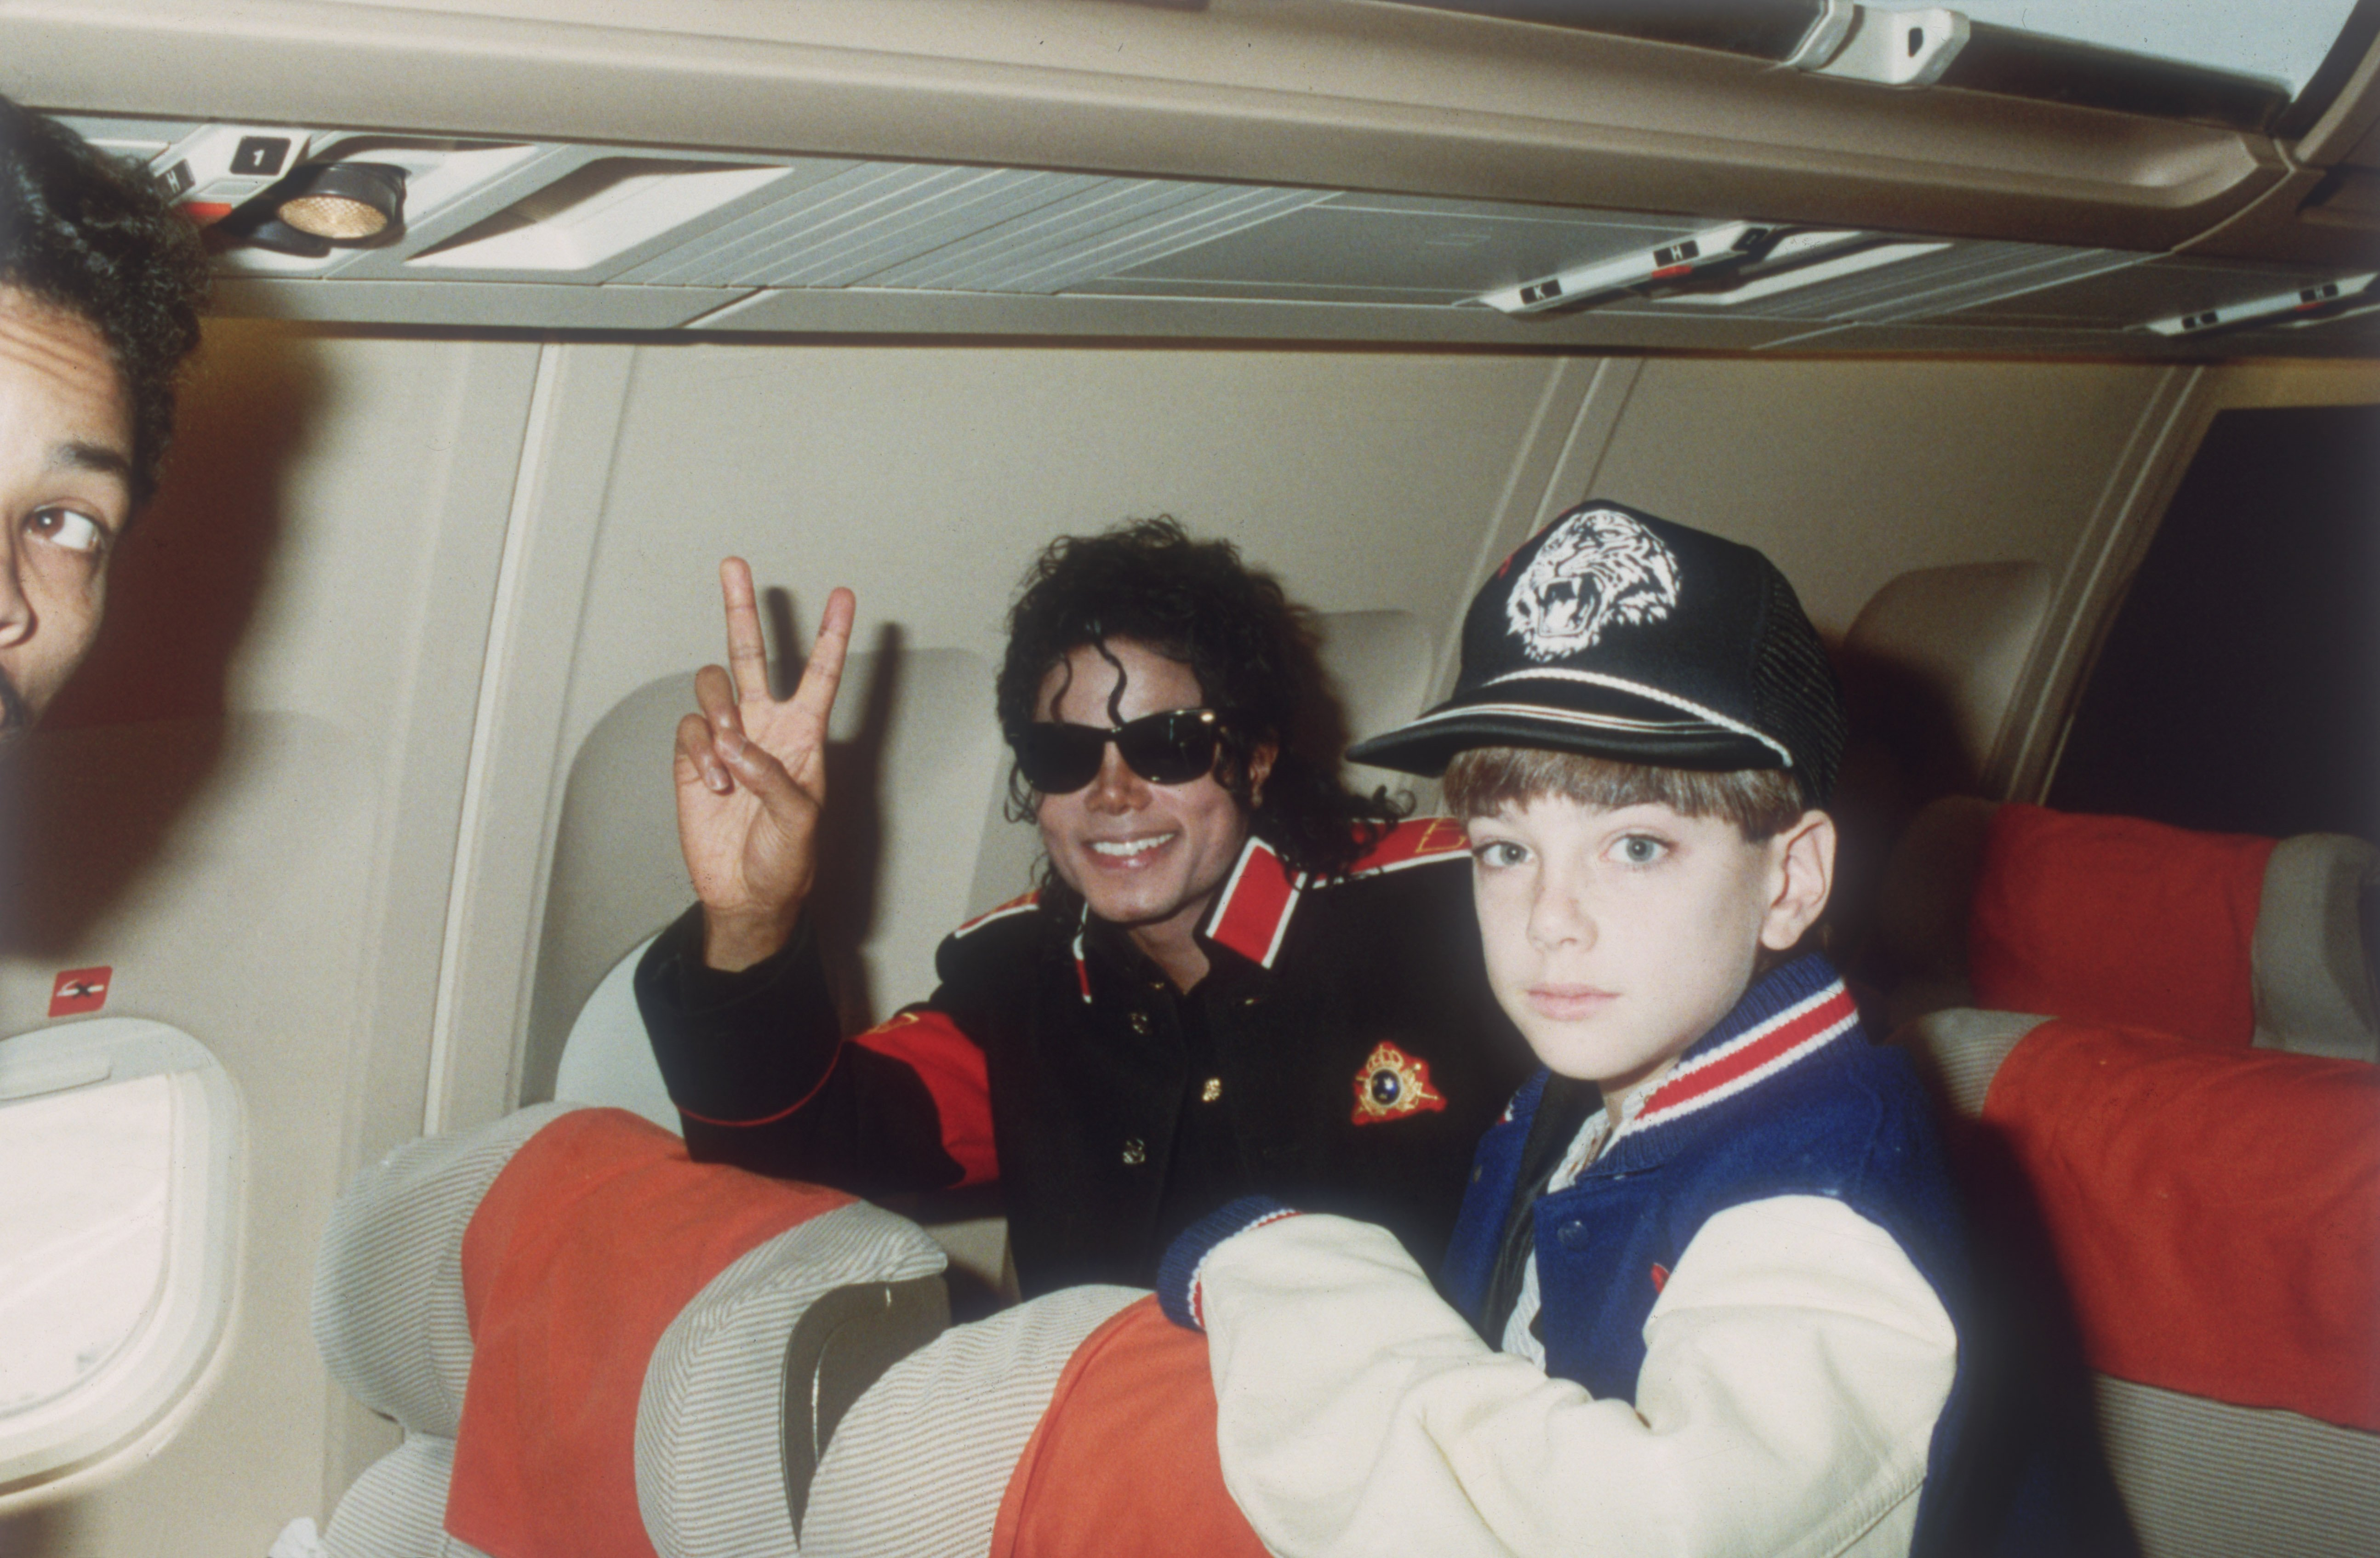 Michael Jackson und 10-jähriger James Safechuck | Quelle: Getty Images